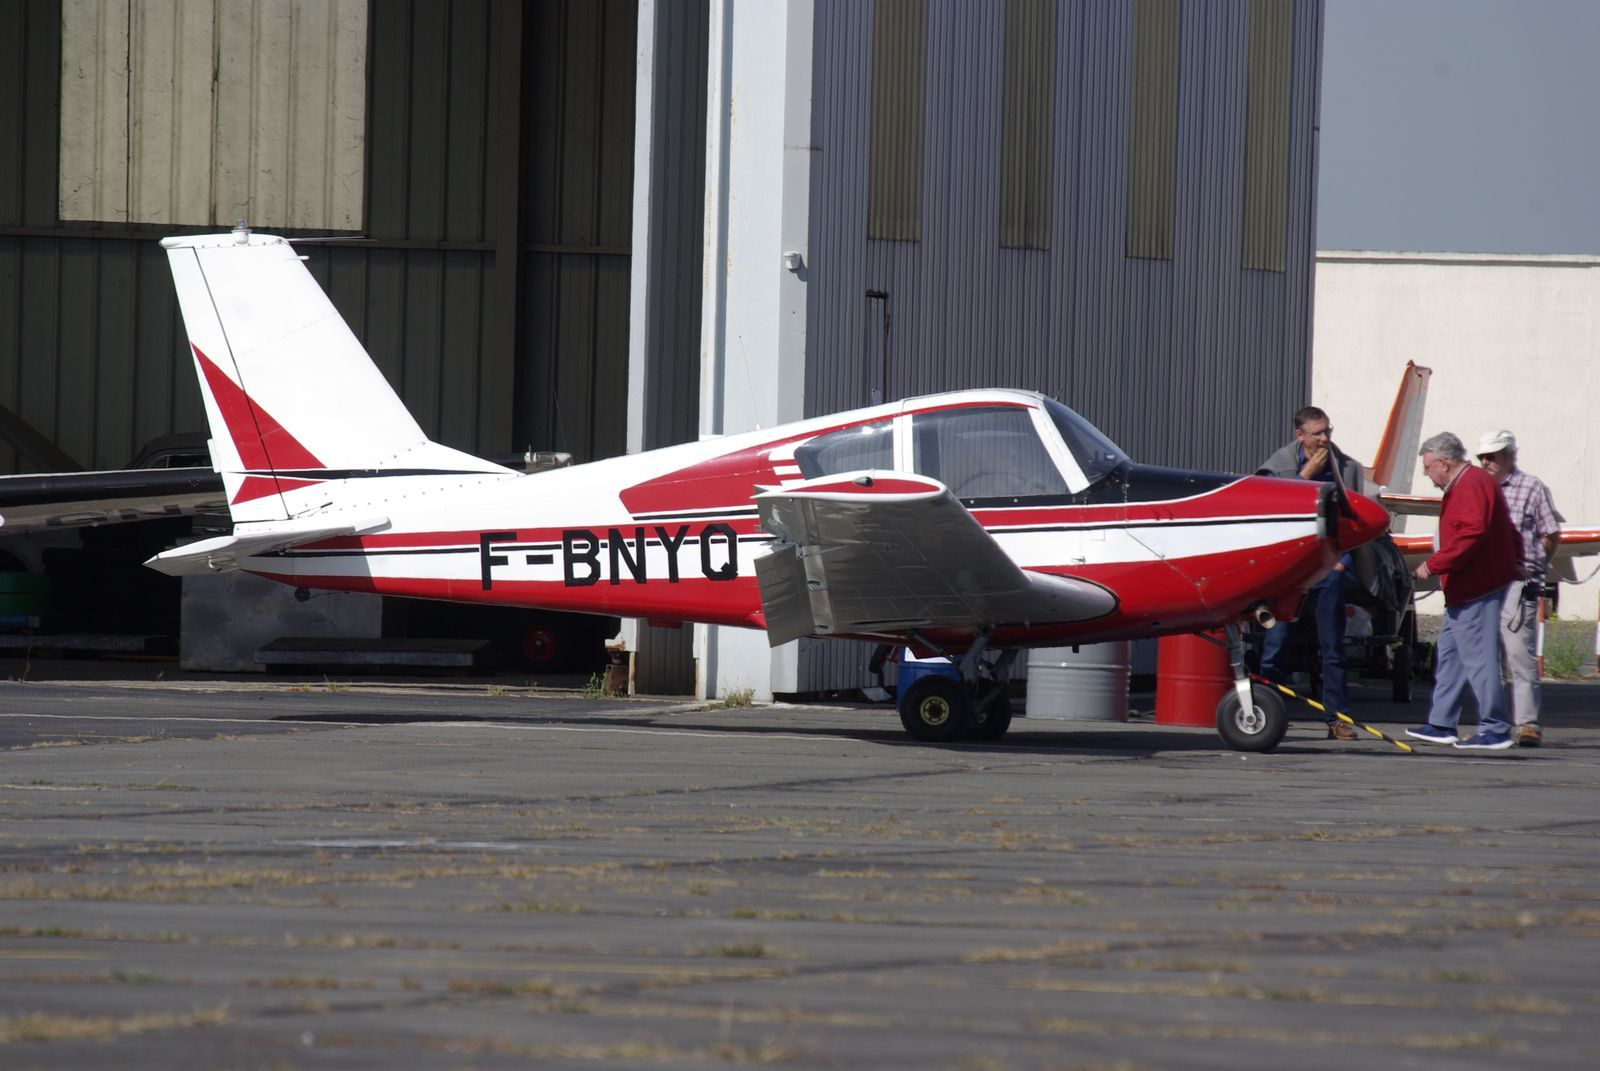 Le Gardan GY-80 Horizon N°191 F-BNYQ est basé localement.